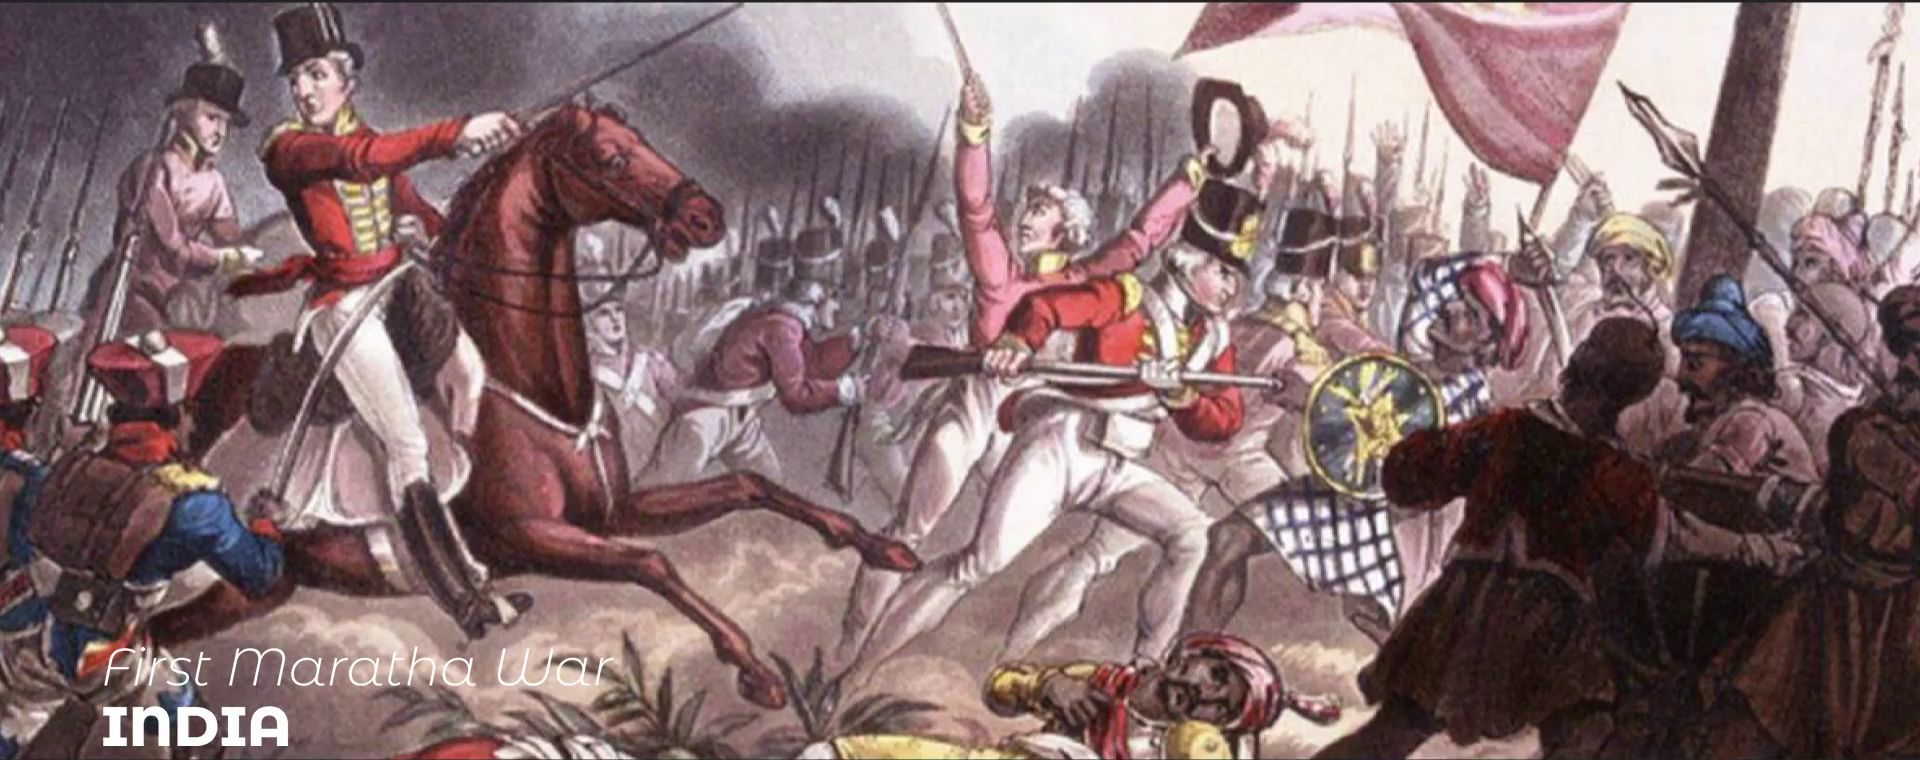 FIRST MARATHA WAR